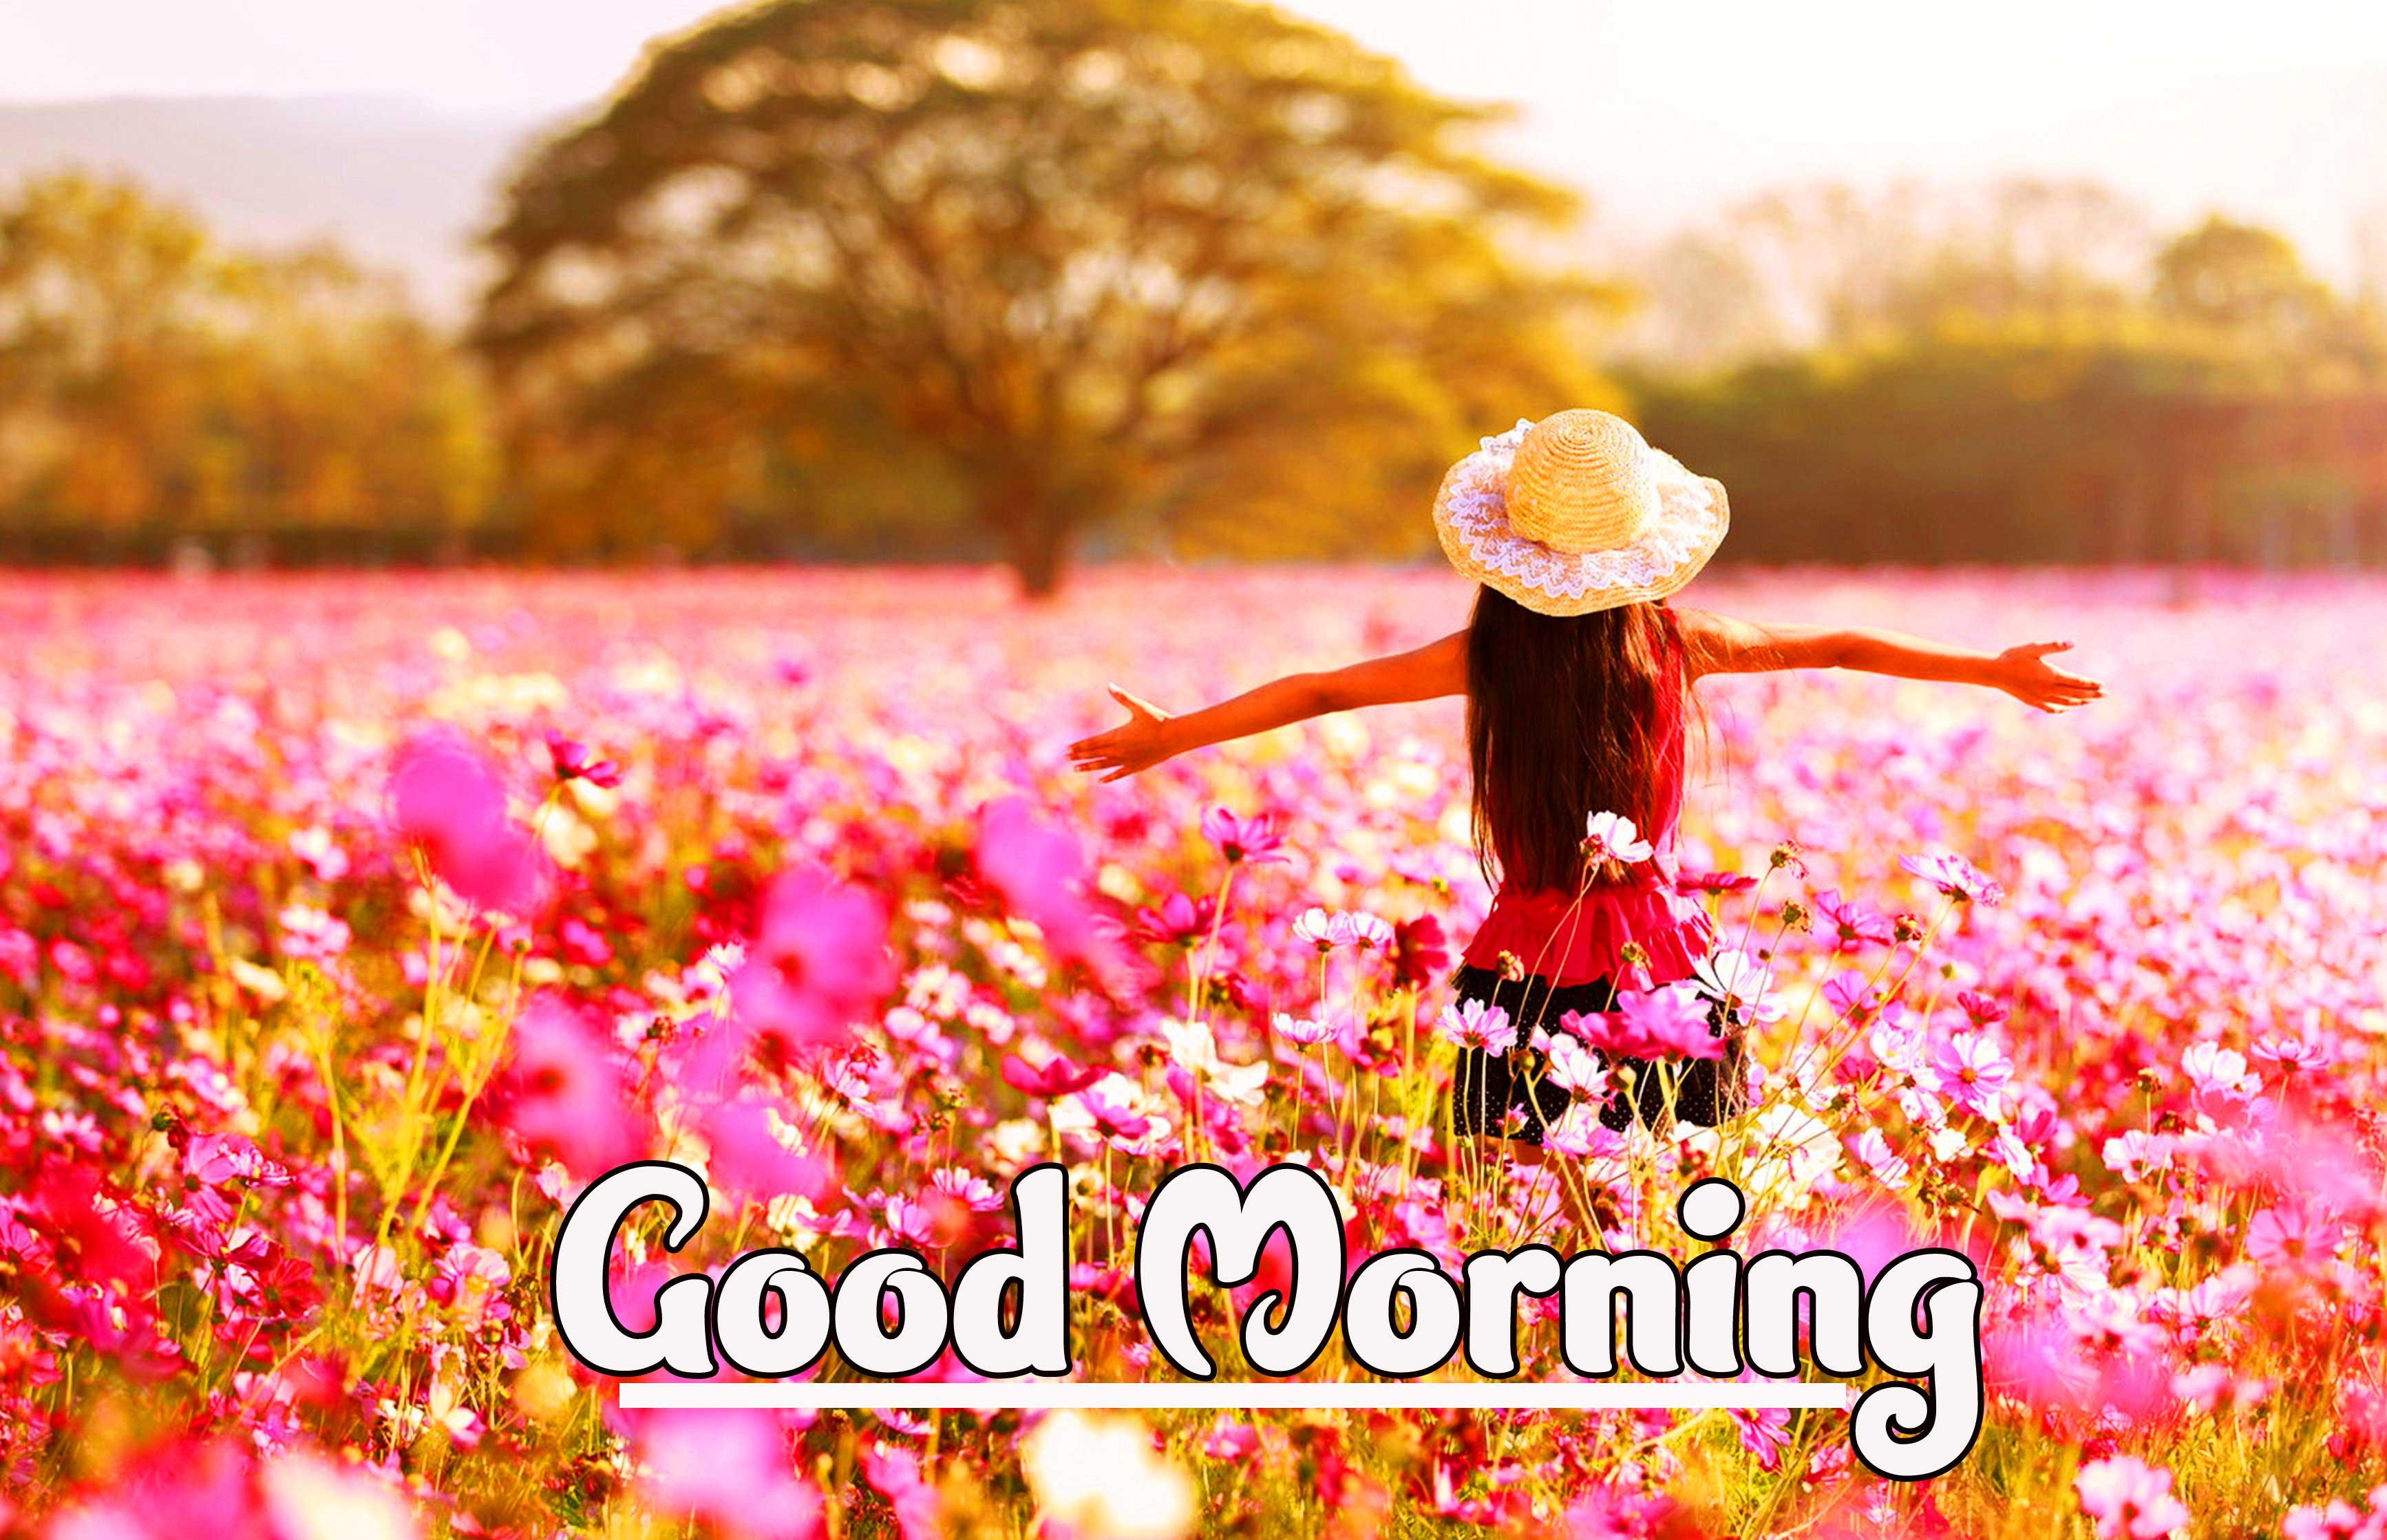 Good Morning Beautiful Ladies / Stylish Girls Images Wallpaper HD Download